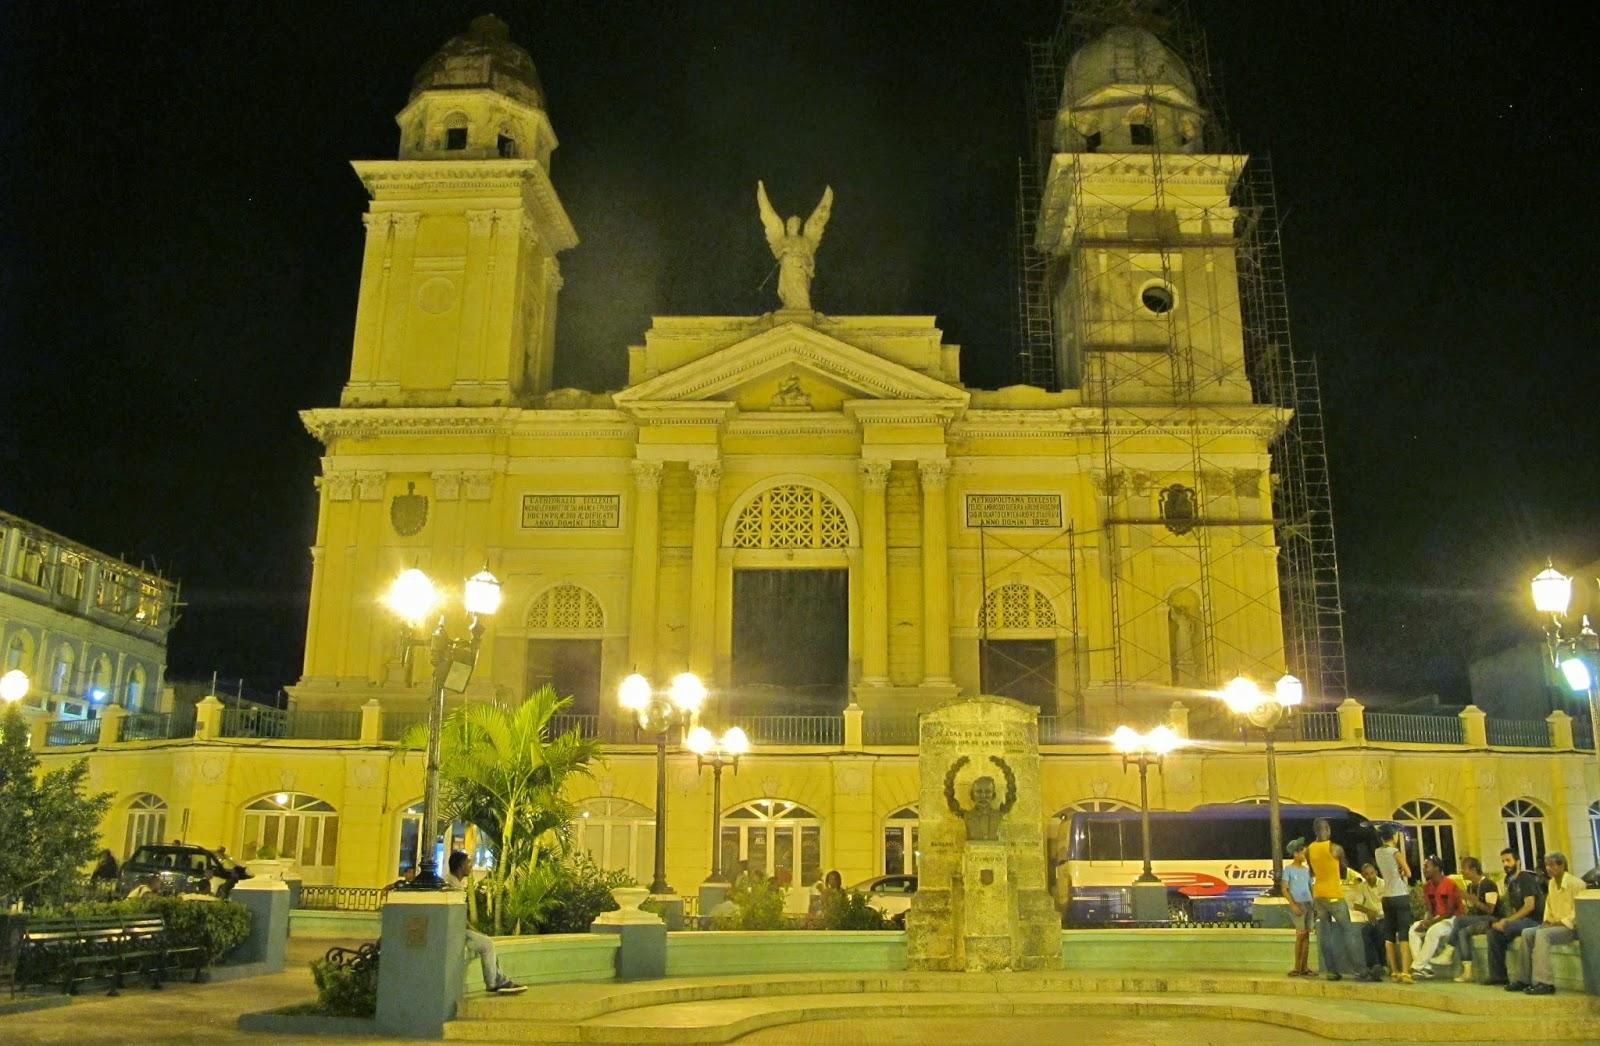 Desencantos em Santiago de Cuba: Catedral fechada para reformas